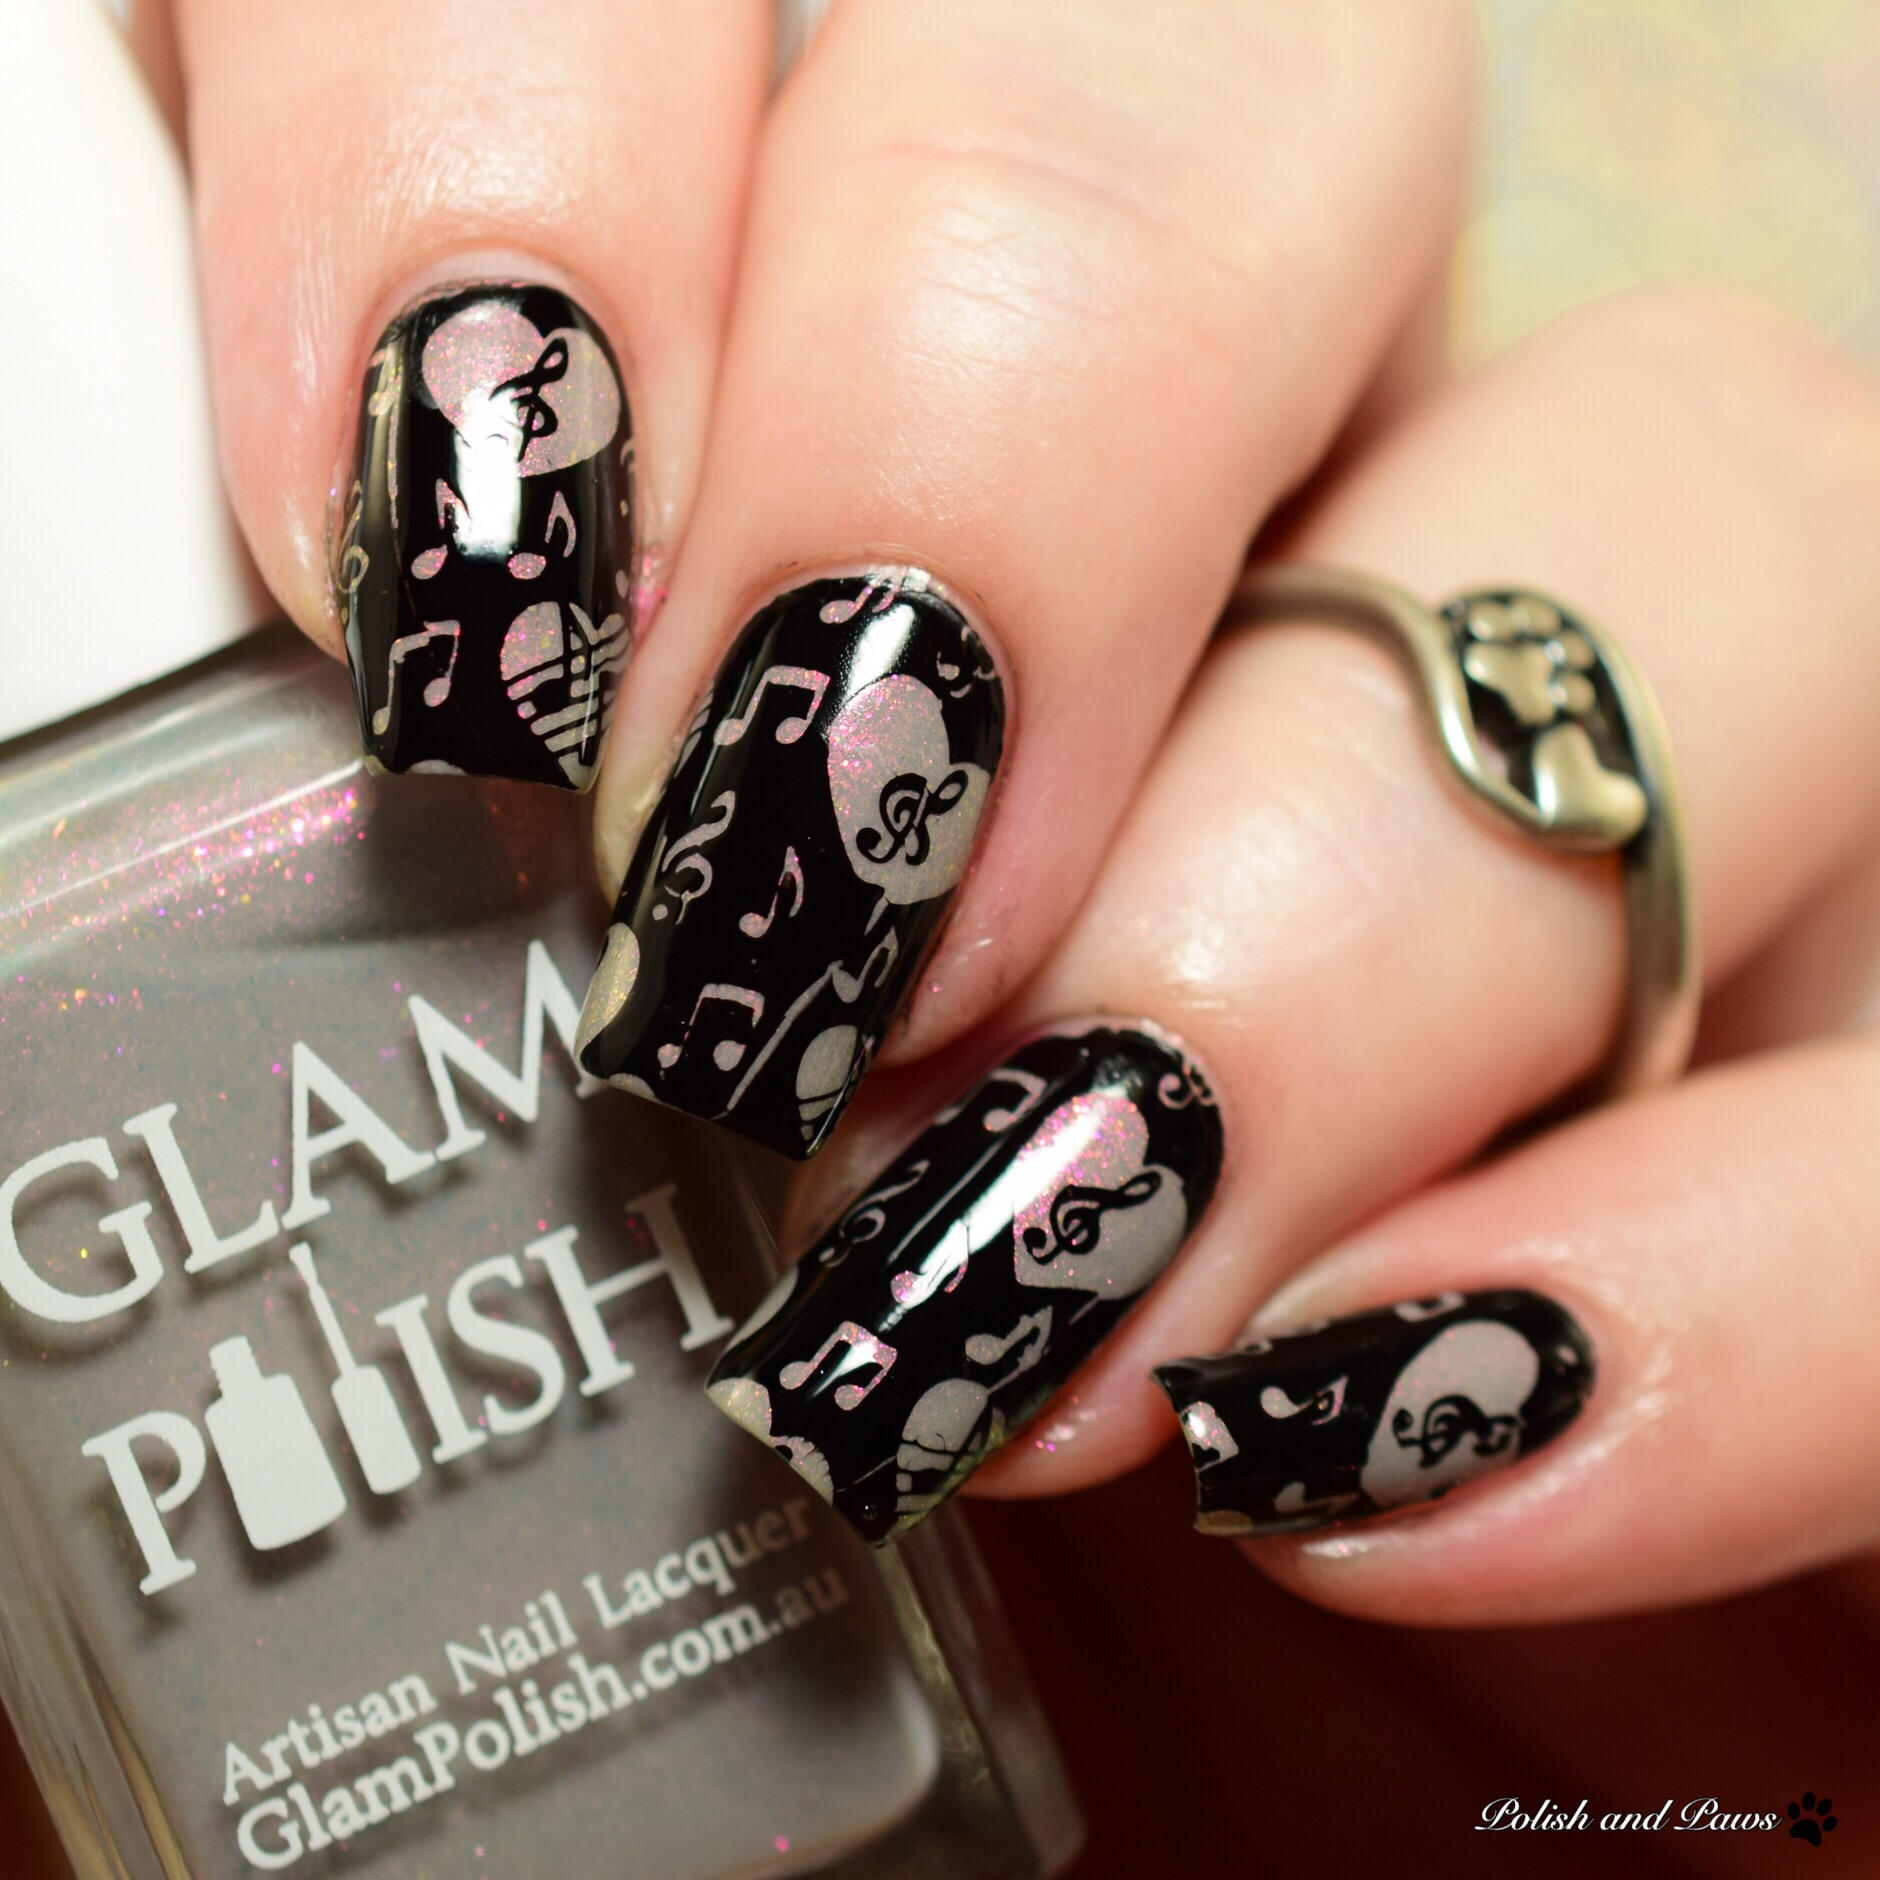 Glam Polish Magical Spells Nail Art